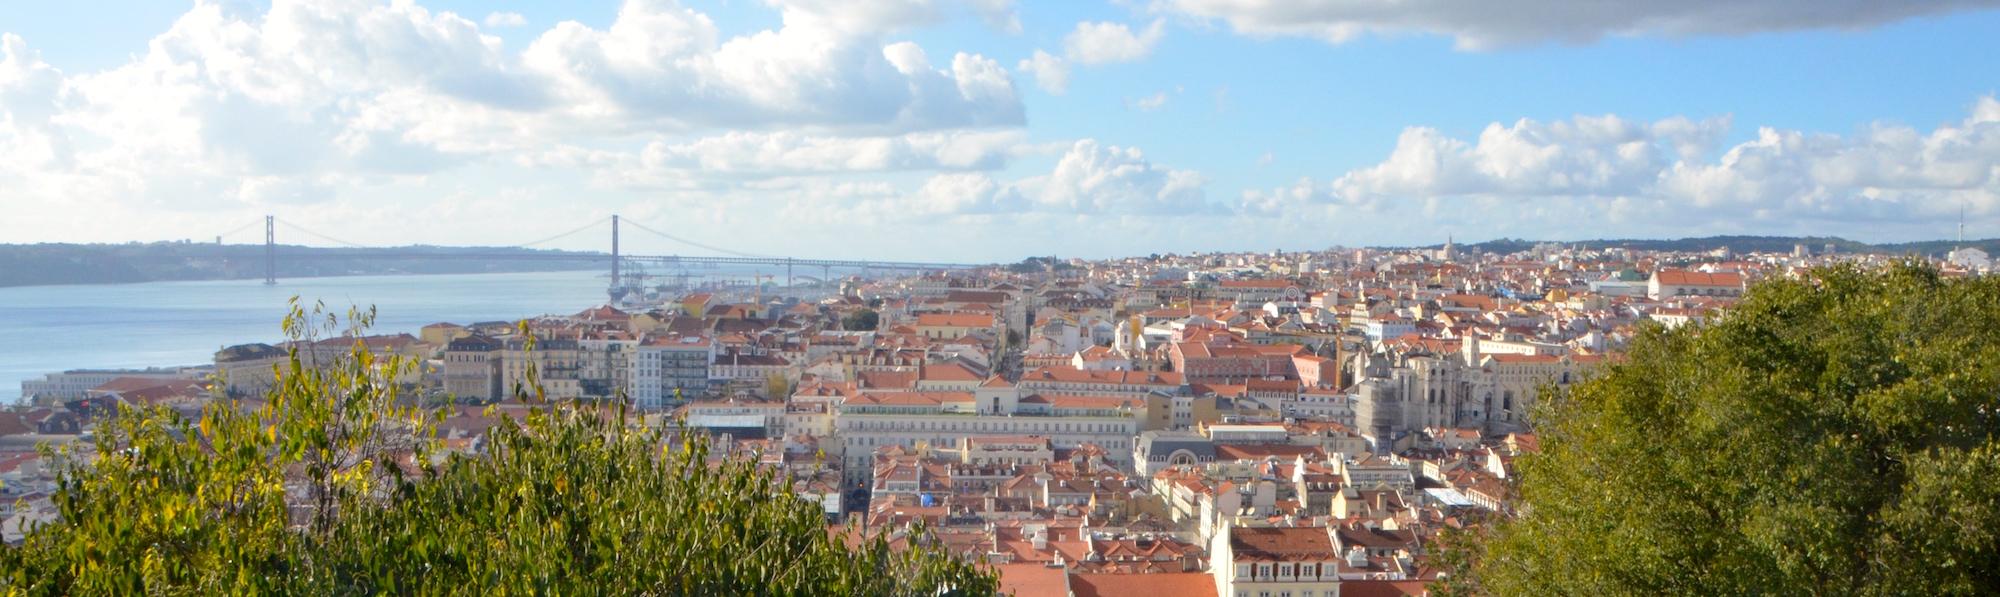 Castillo de San Jorge Abajo2, Lisboa